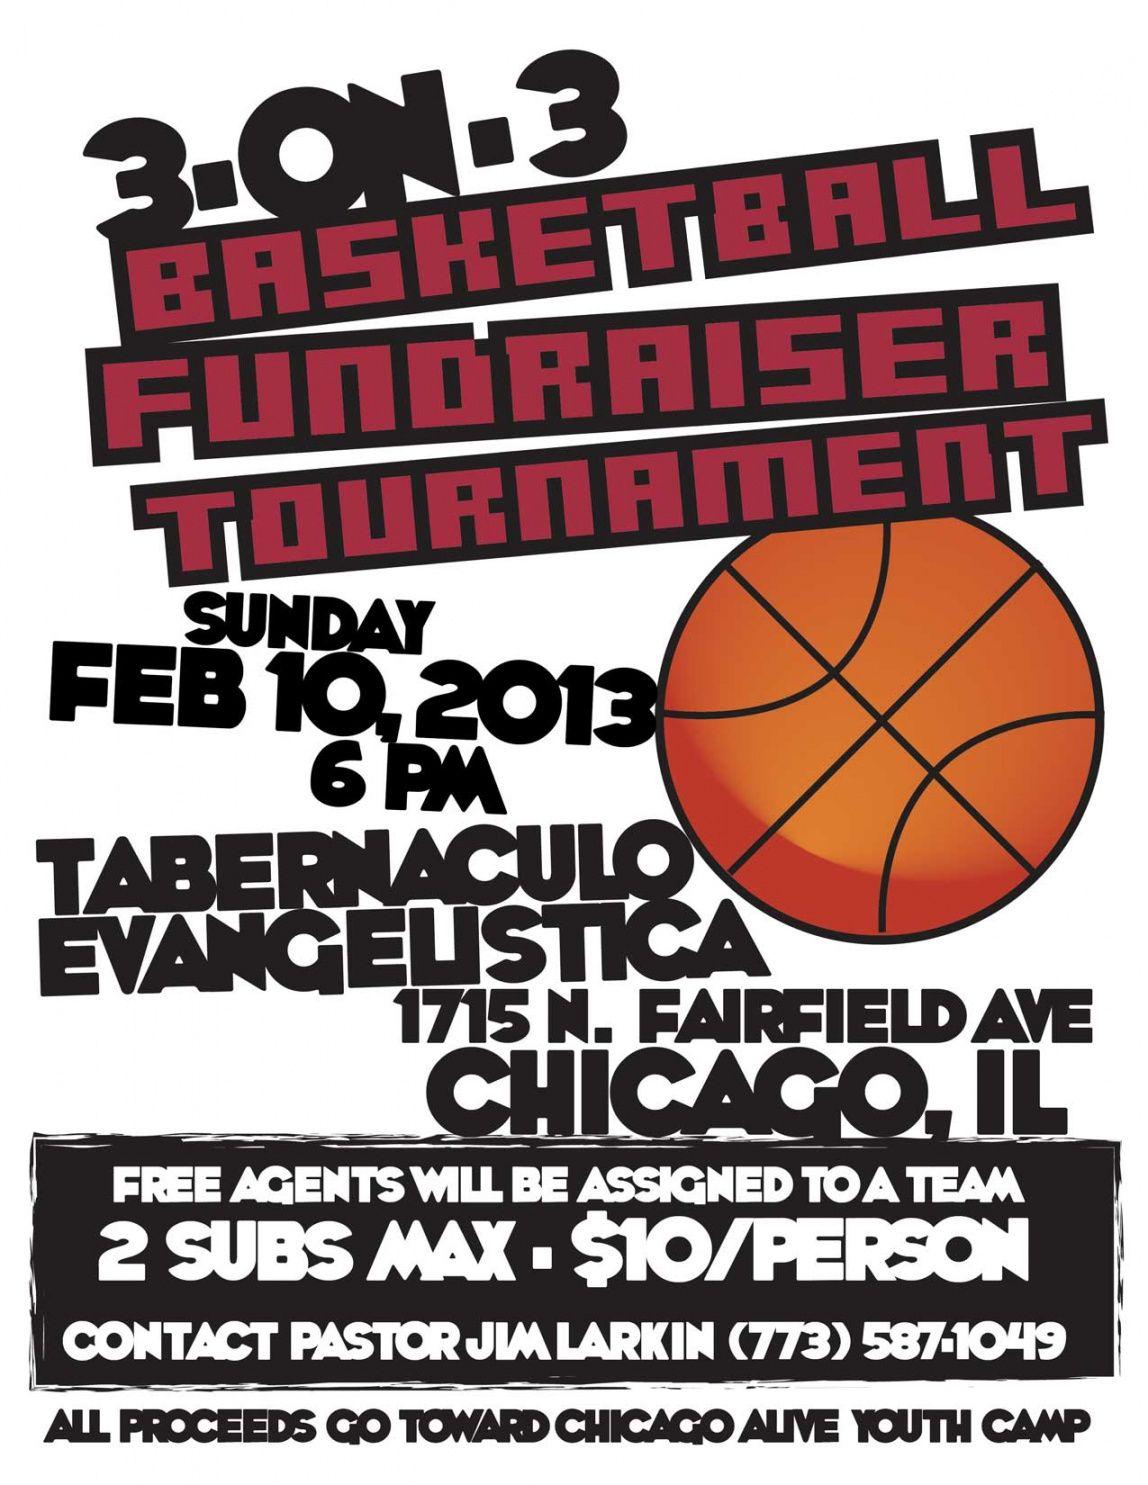 free 12 basketball tournament flyer psd templates free images basketball game flyer template and sample